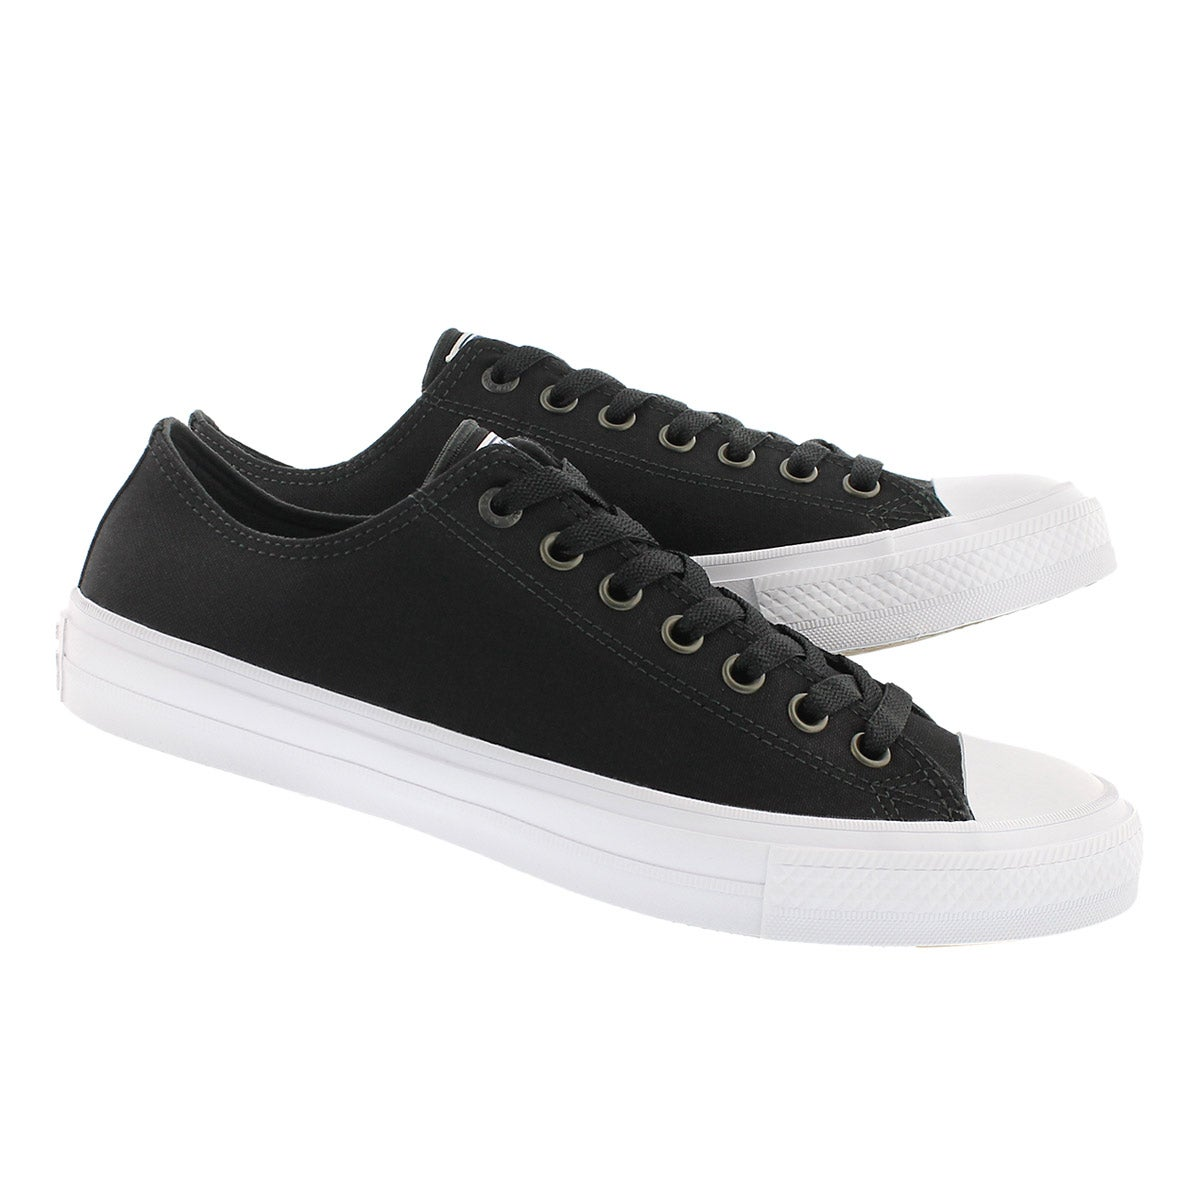 Mns Chuck II Viz Flow black sneaker